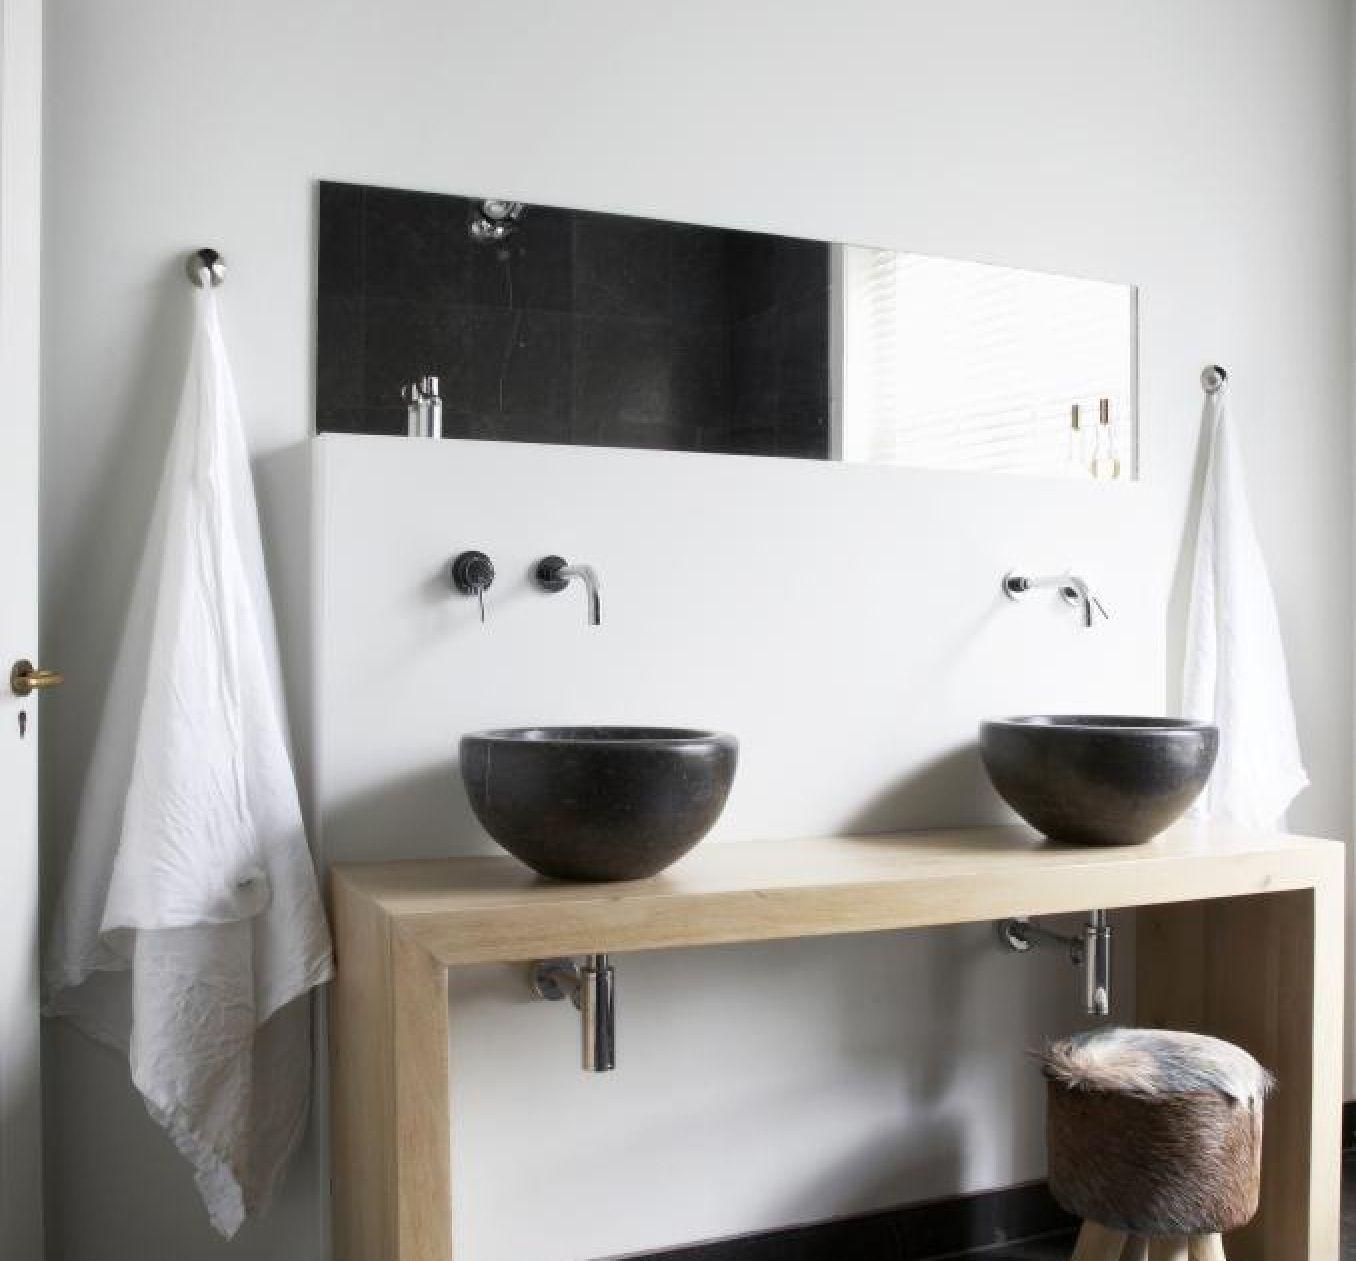 Reforma ba o con lavabos dise o negros sobre encimera de - Grifos para bano ...